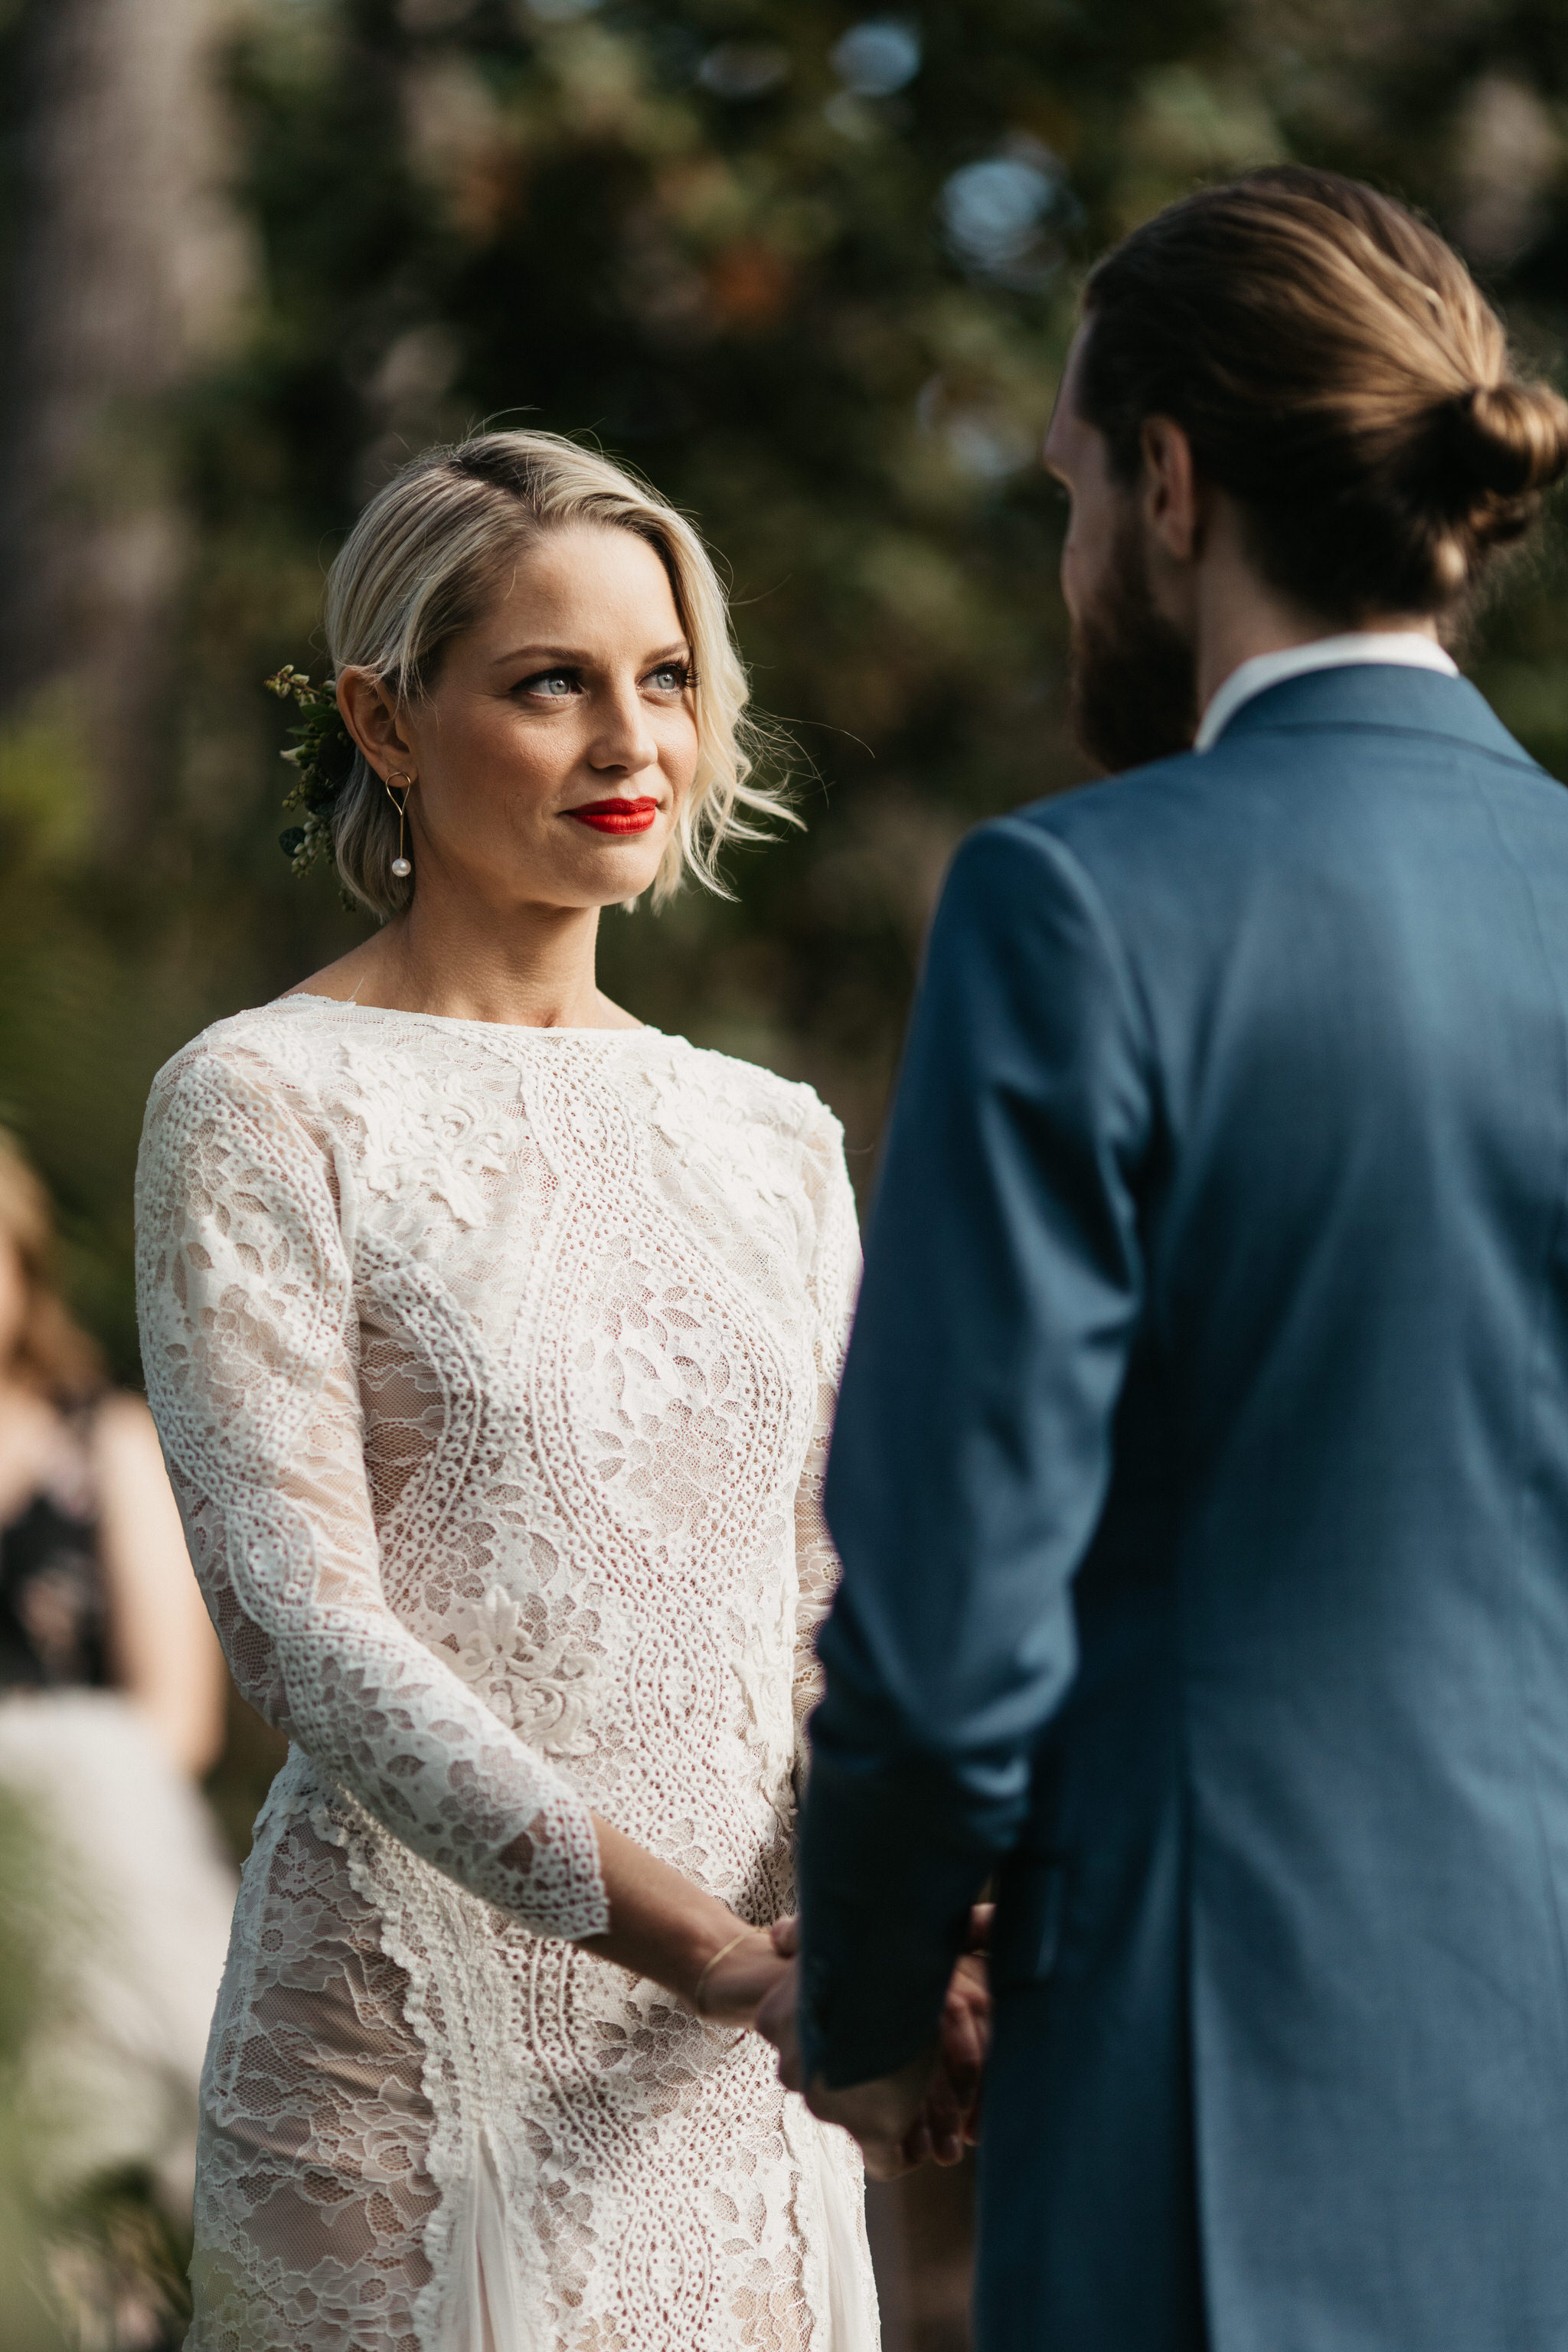 032_SBA-Jen-Tom-Wedding-98_Sunshine_Coast_wedding_photographer.jpg